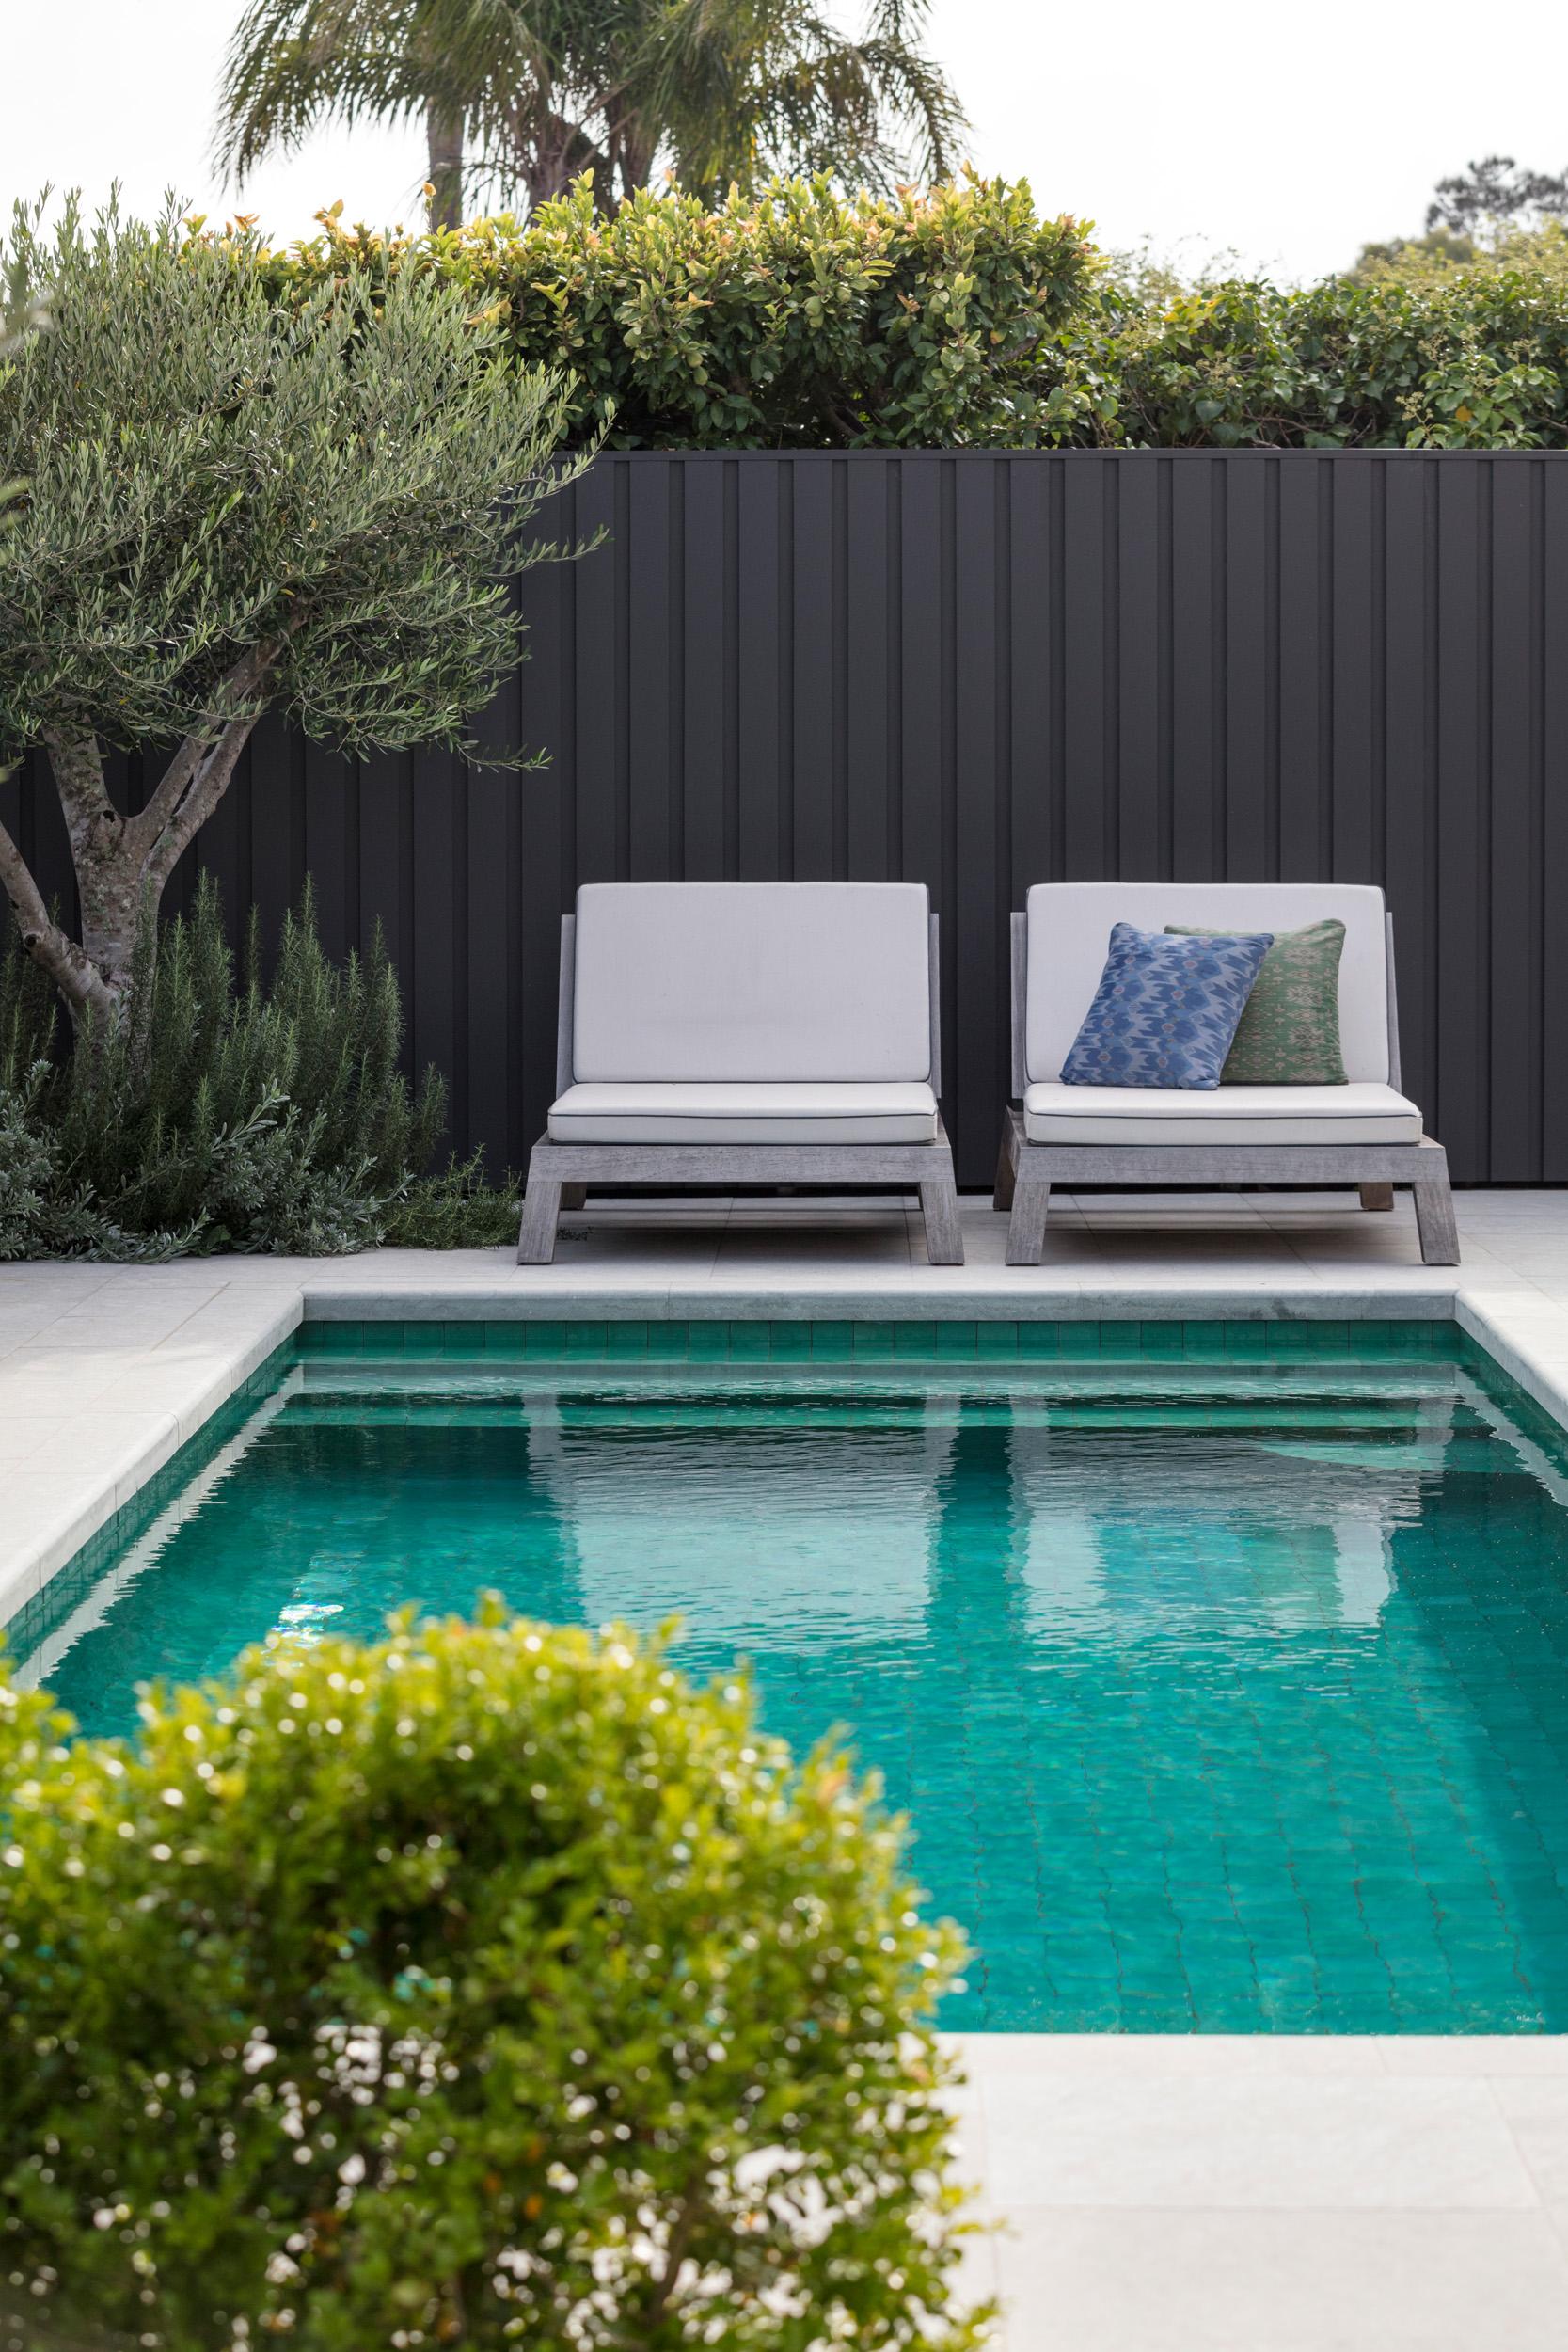 Jem_Cresswell_Architecture_Residential_Photographer_Sydney_Australia_010.jpg